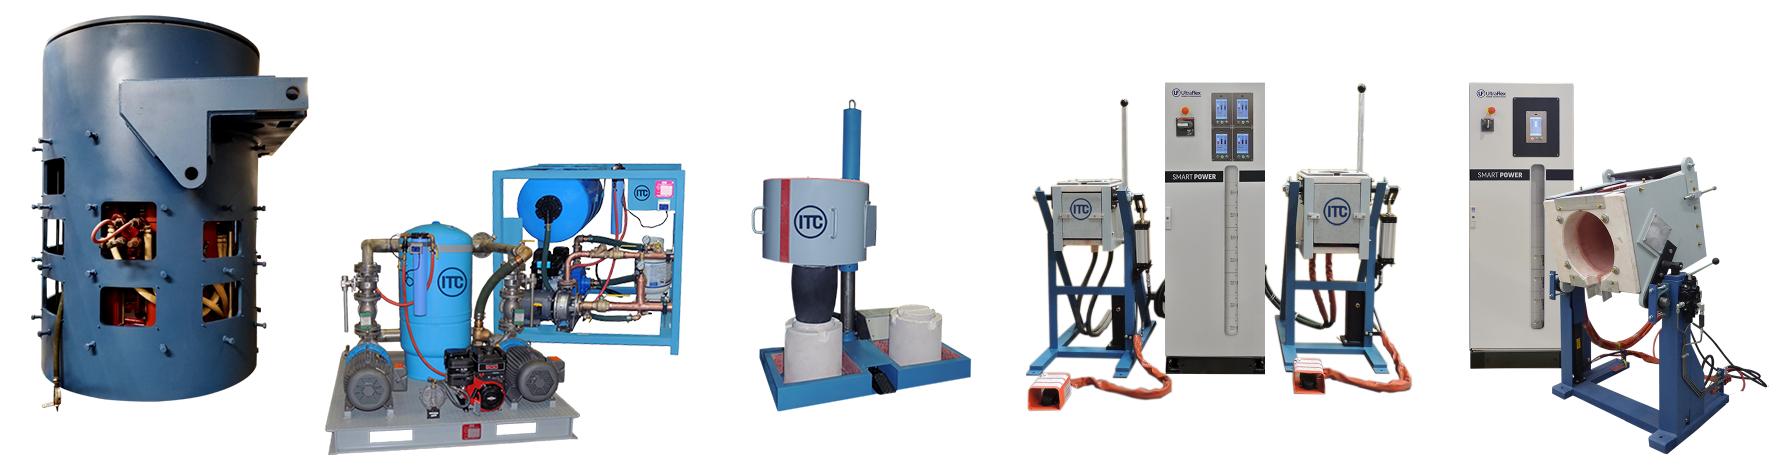 induction melting equipment